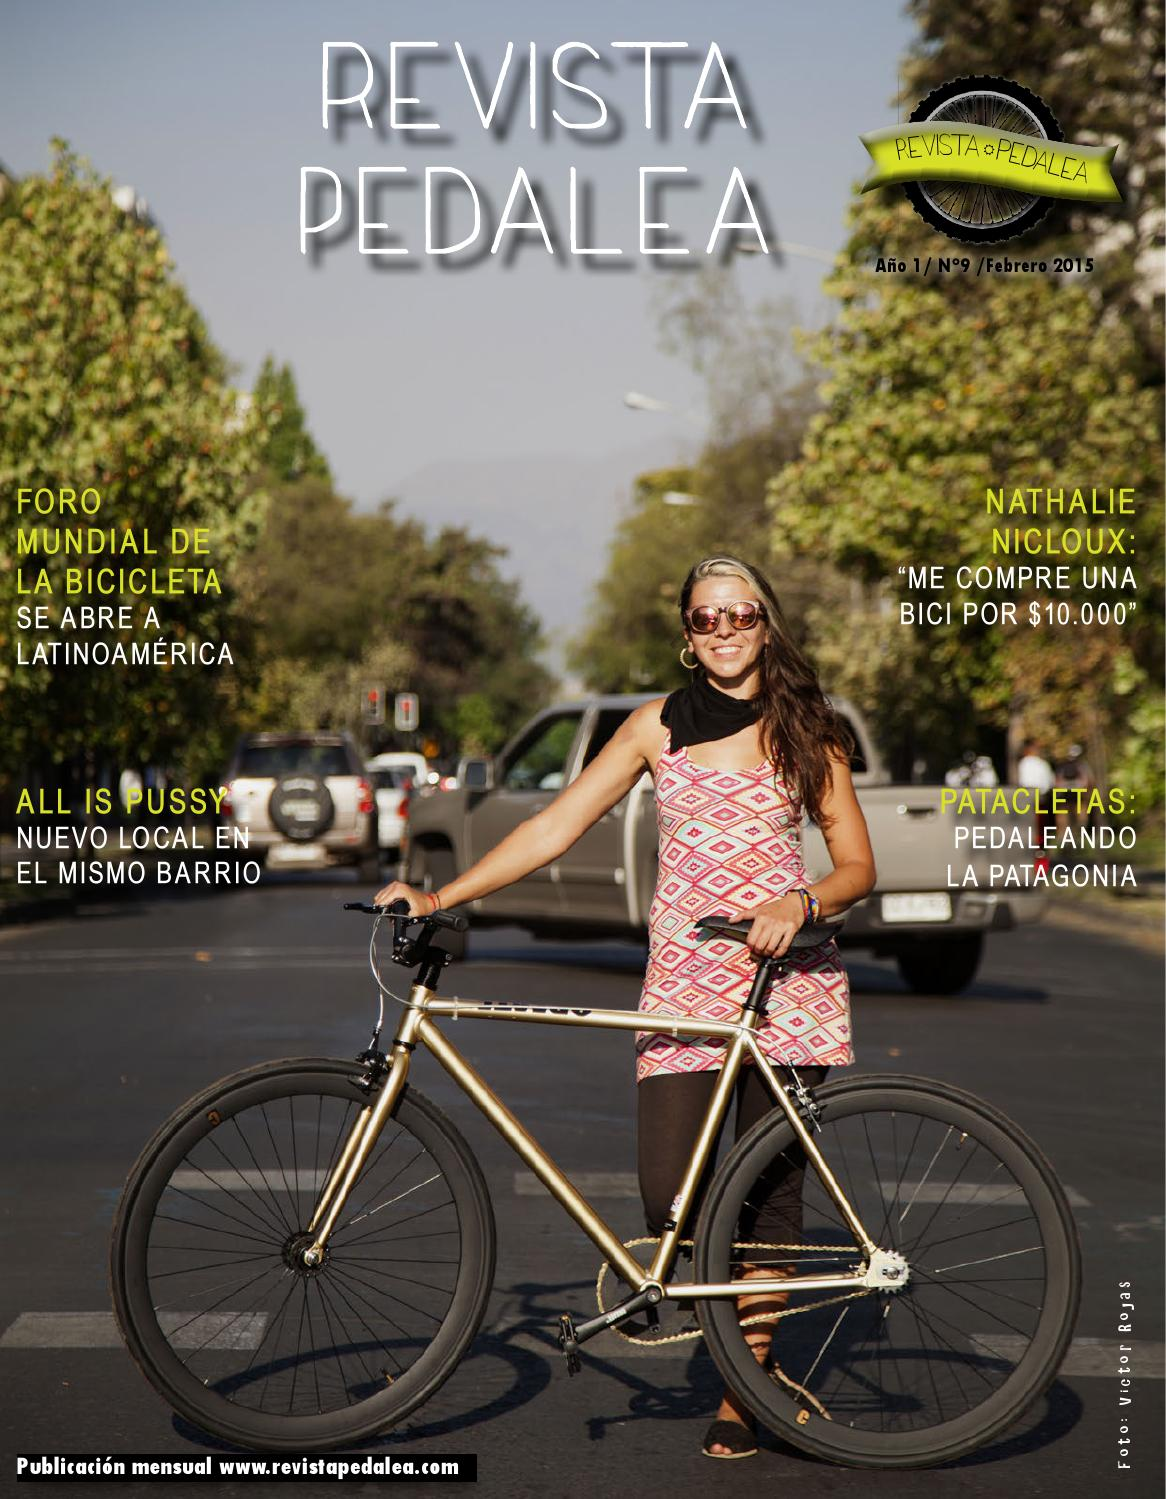 Revista pedalea #9 by Revista Pedalea - issuu